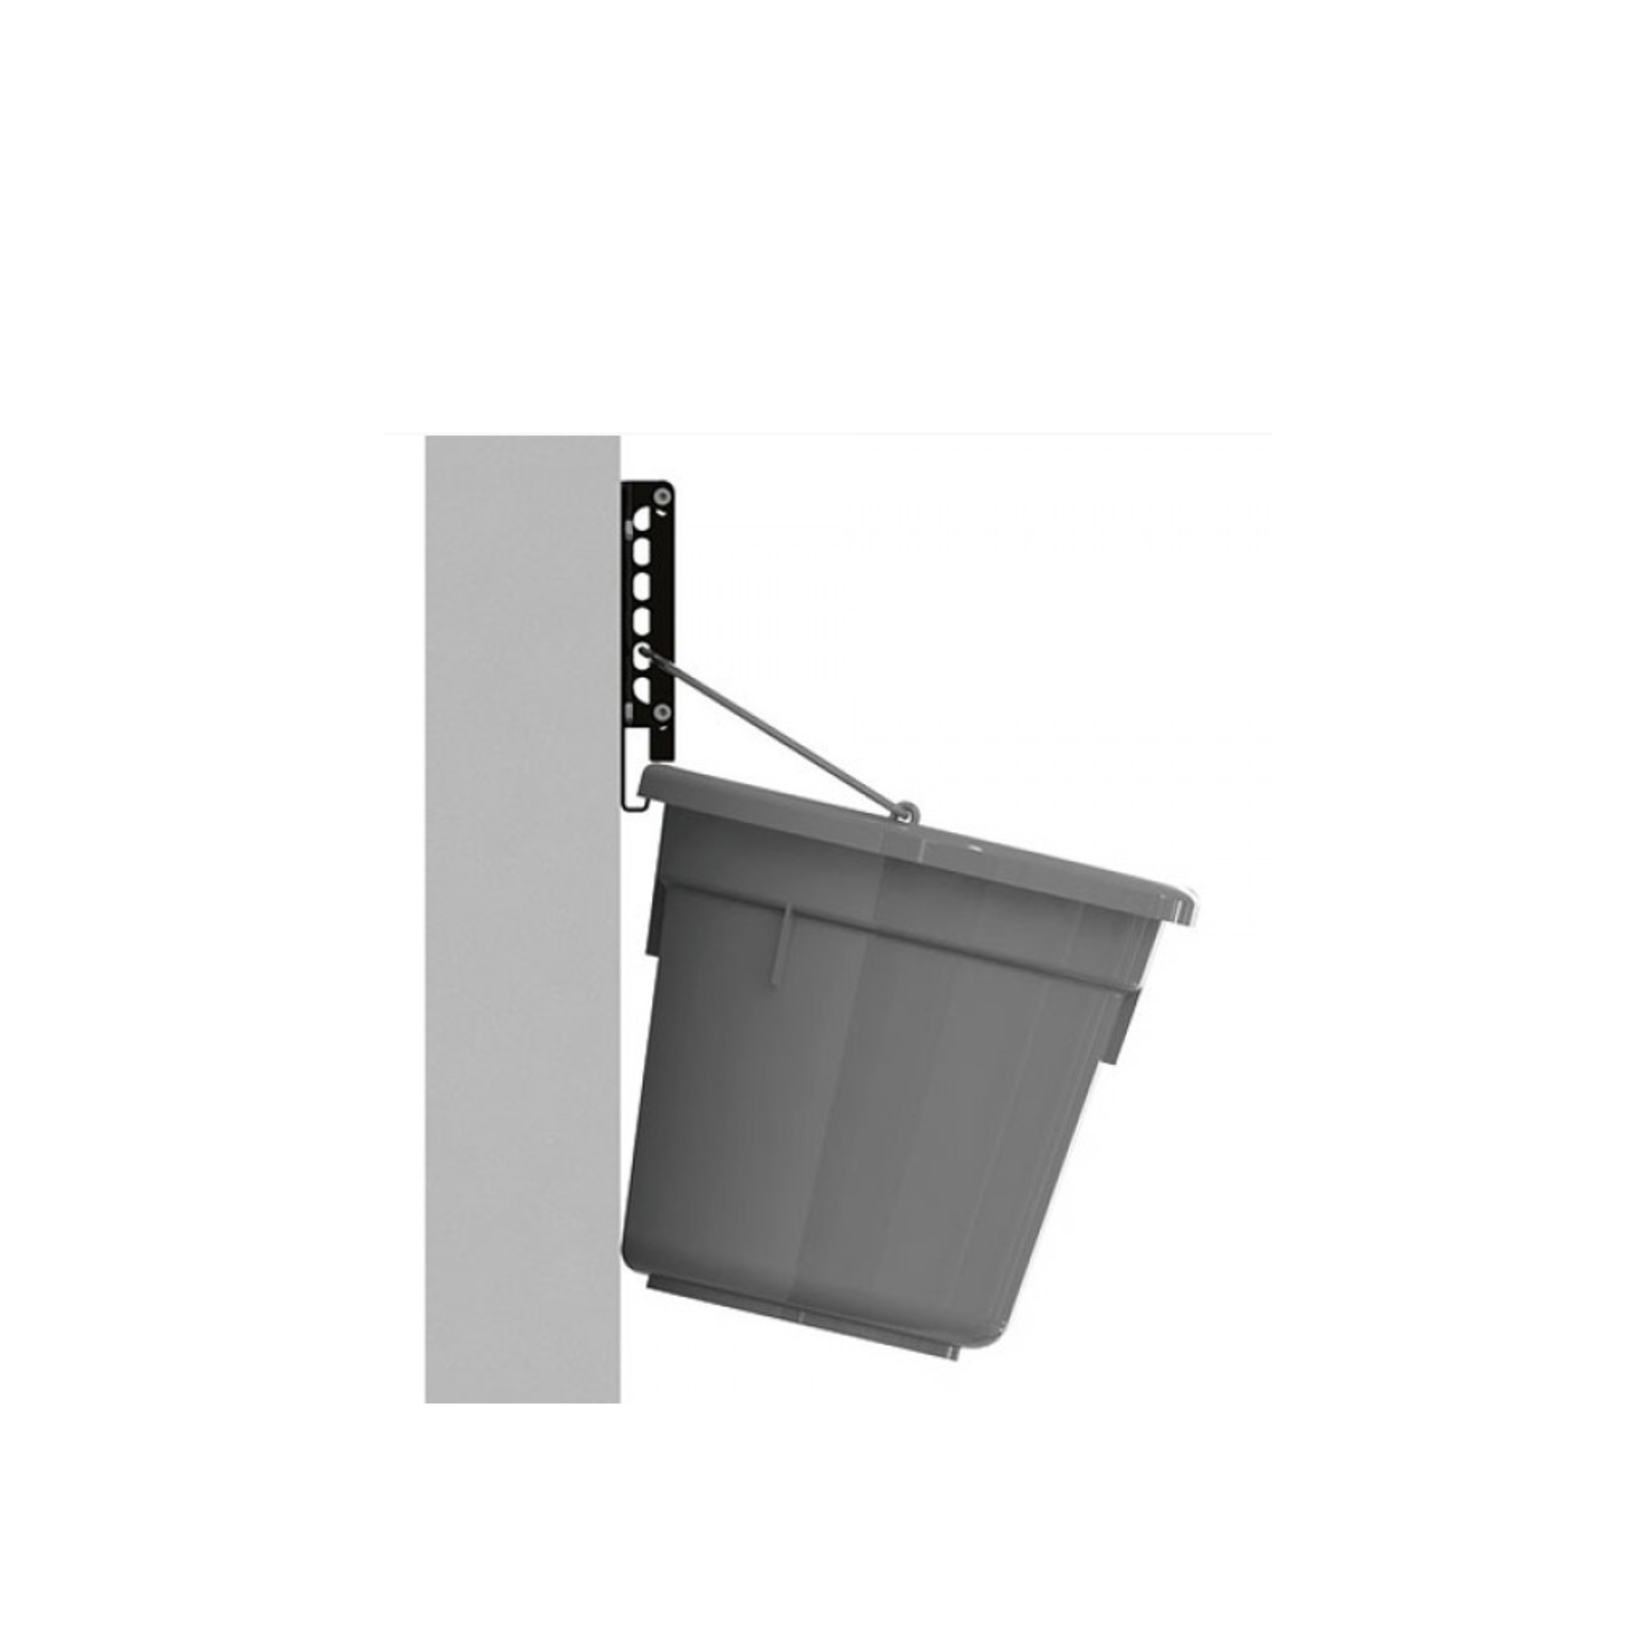 Kerbl Kerbl Wandbevestigingsbeugel voor emmer met vlakke achterzijde